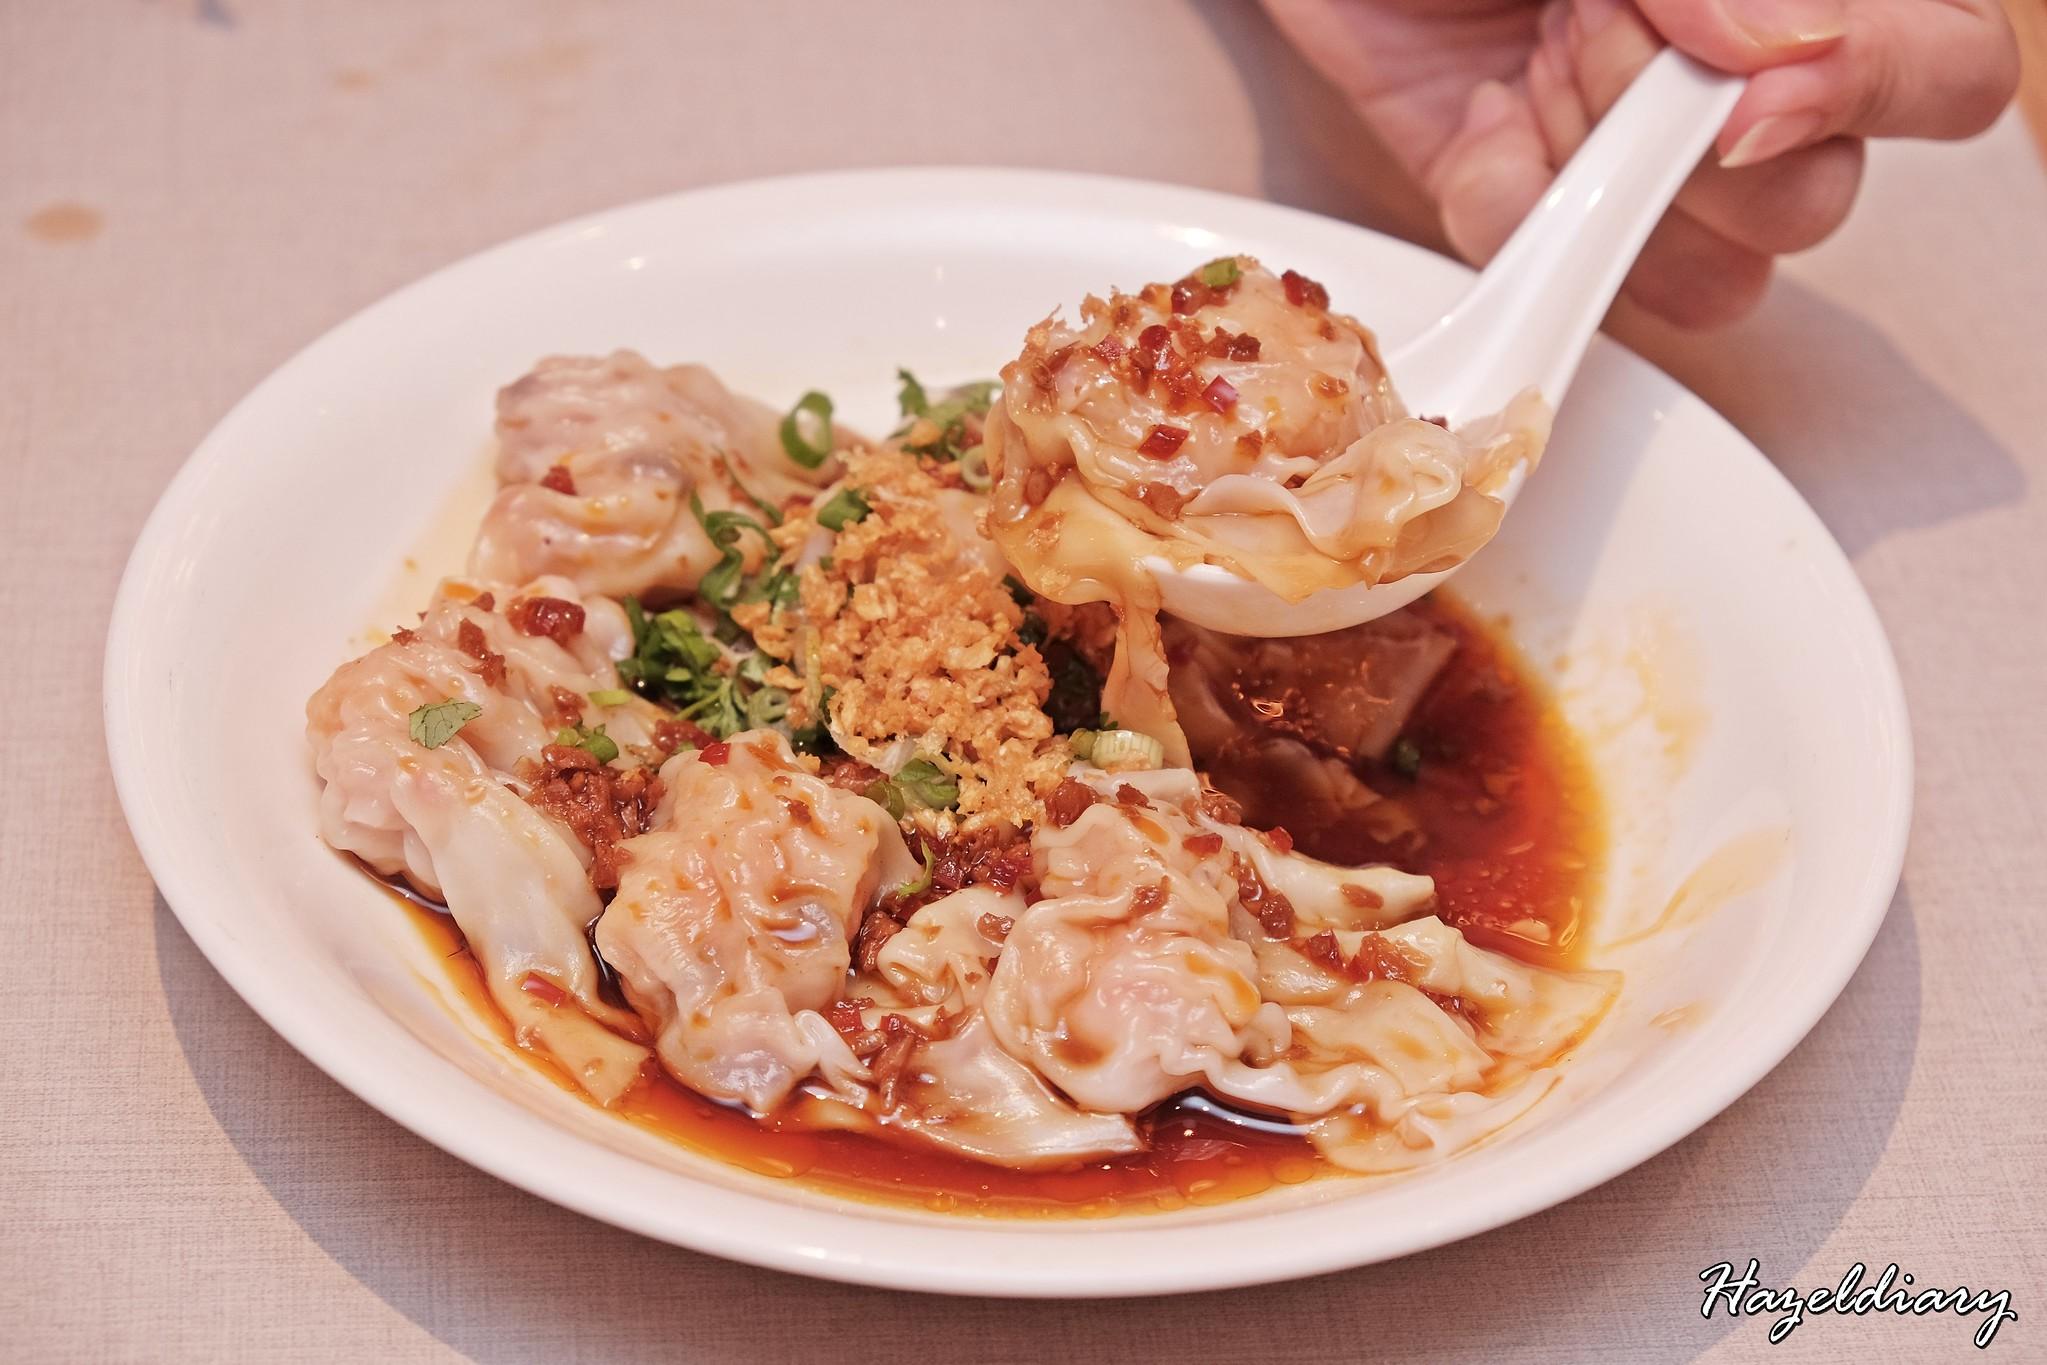 Paradise Dynasty-Prawn and Pork Dumpling in Hot Chili Vinaigrette